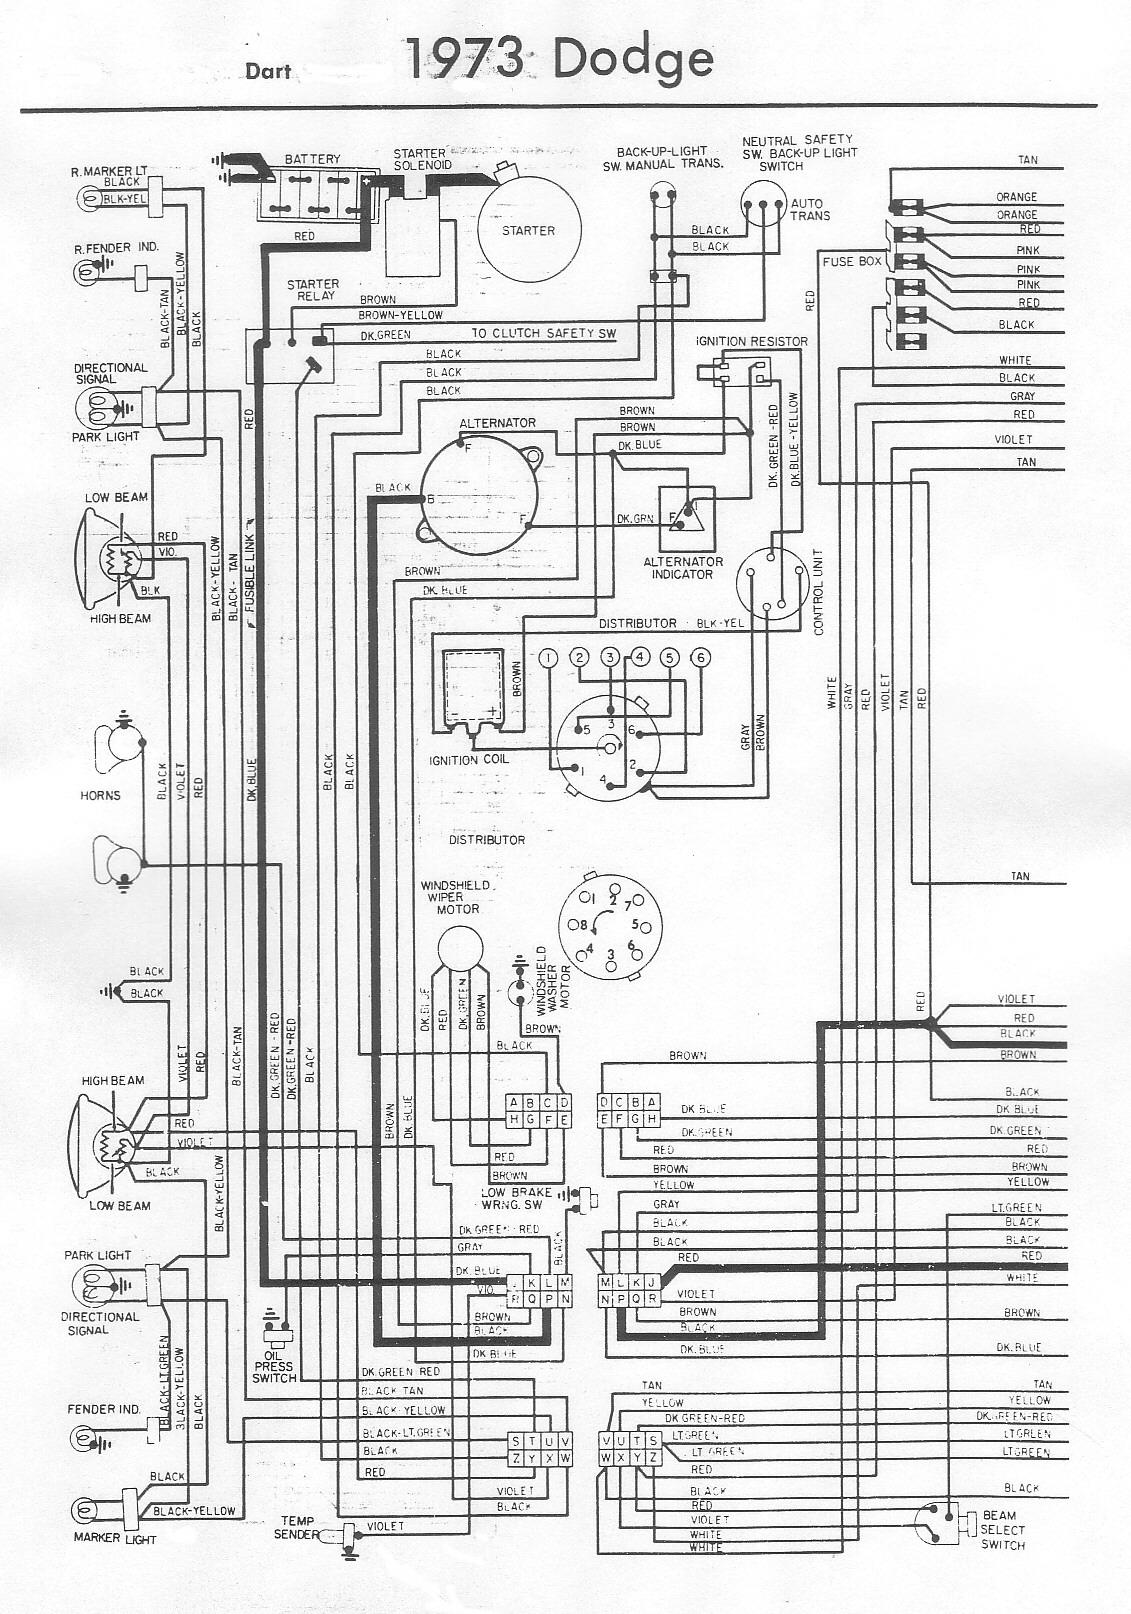 diagram further 1973 dodge charger wiring diagram wiring harness73 dodge charger wiring diagram online wiring diagram [ 1131 x 1614 Pixel ]